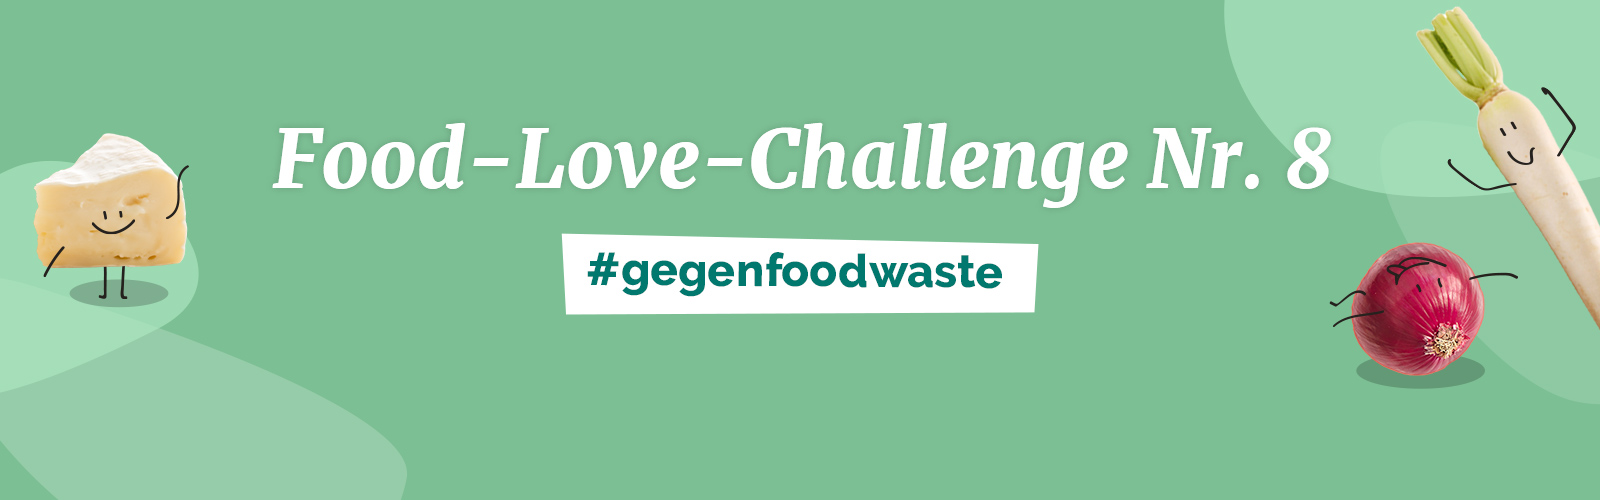 Food Love Challenge Nr. 8